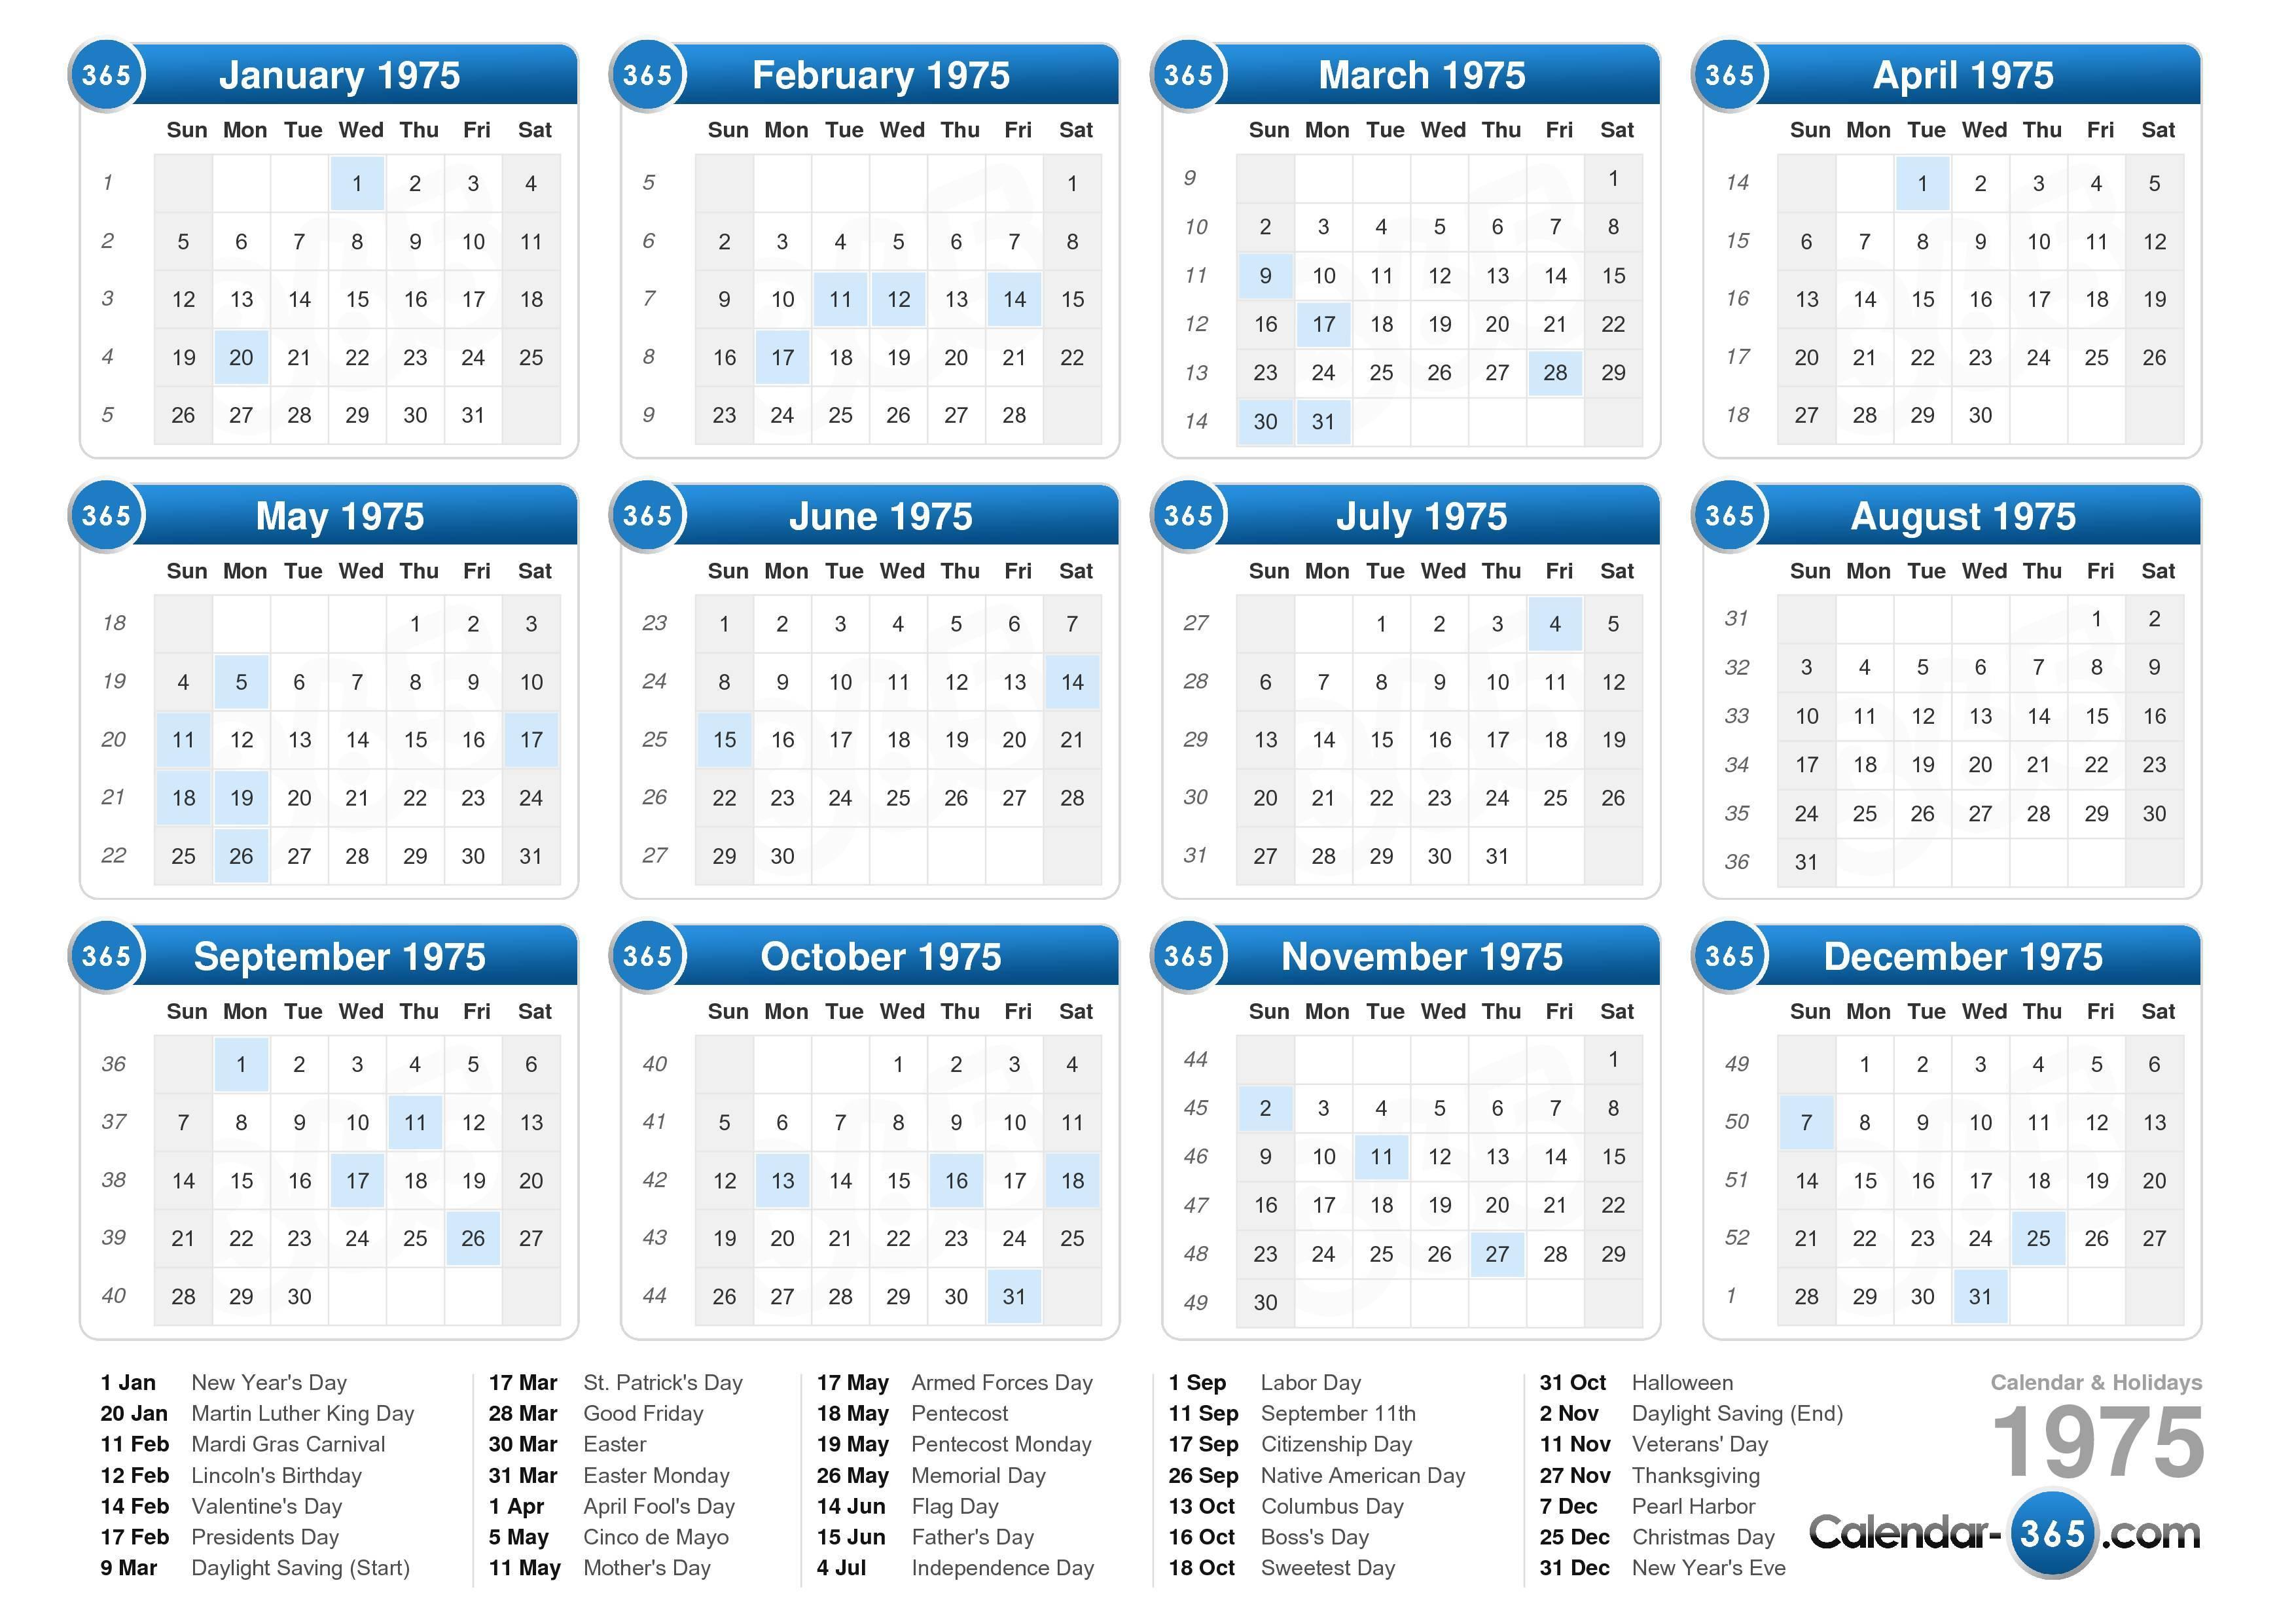 ... calendar with holidays landscape format 1 page 1975 calendar 329 8 059